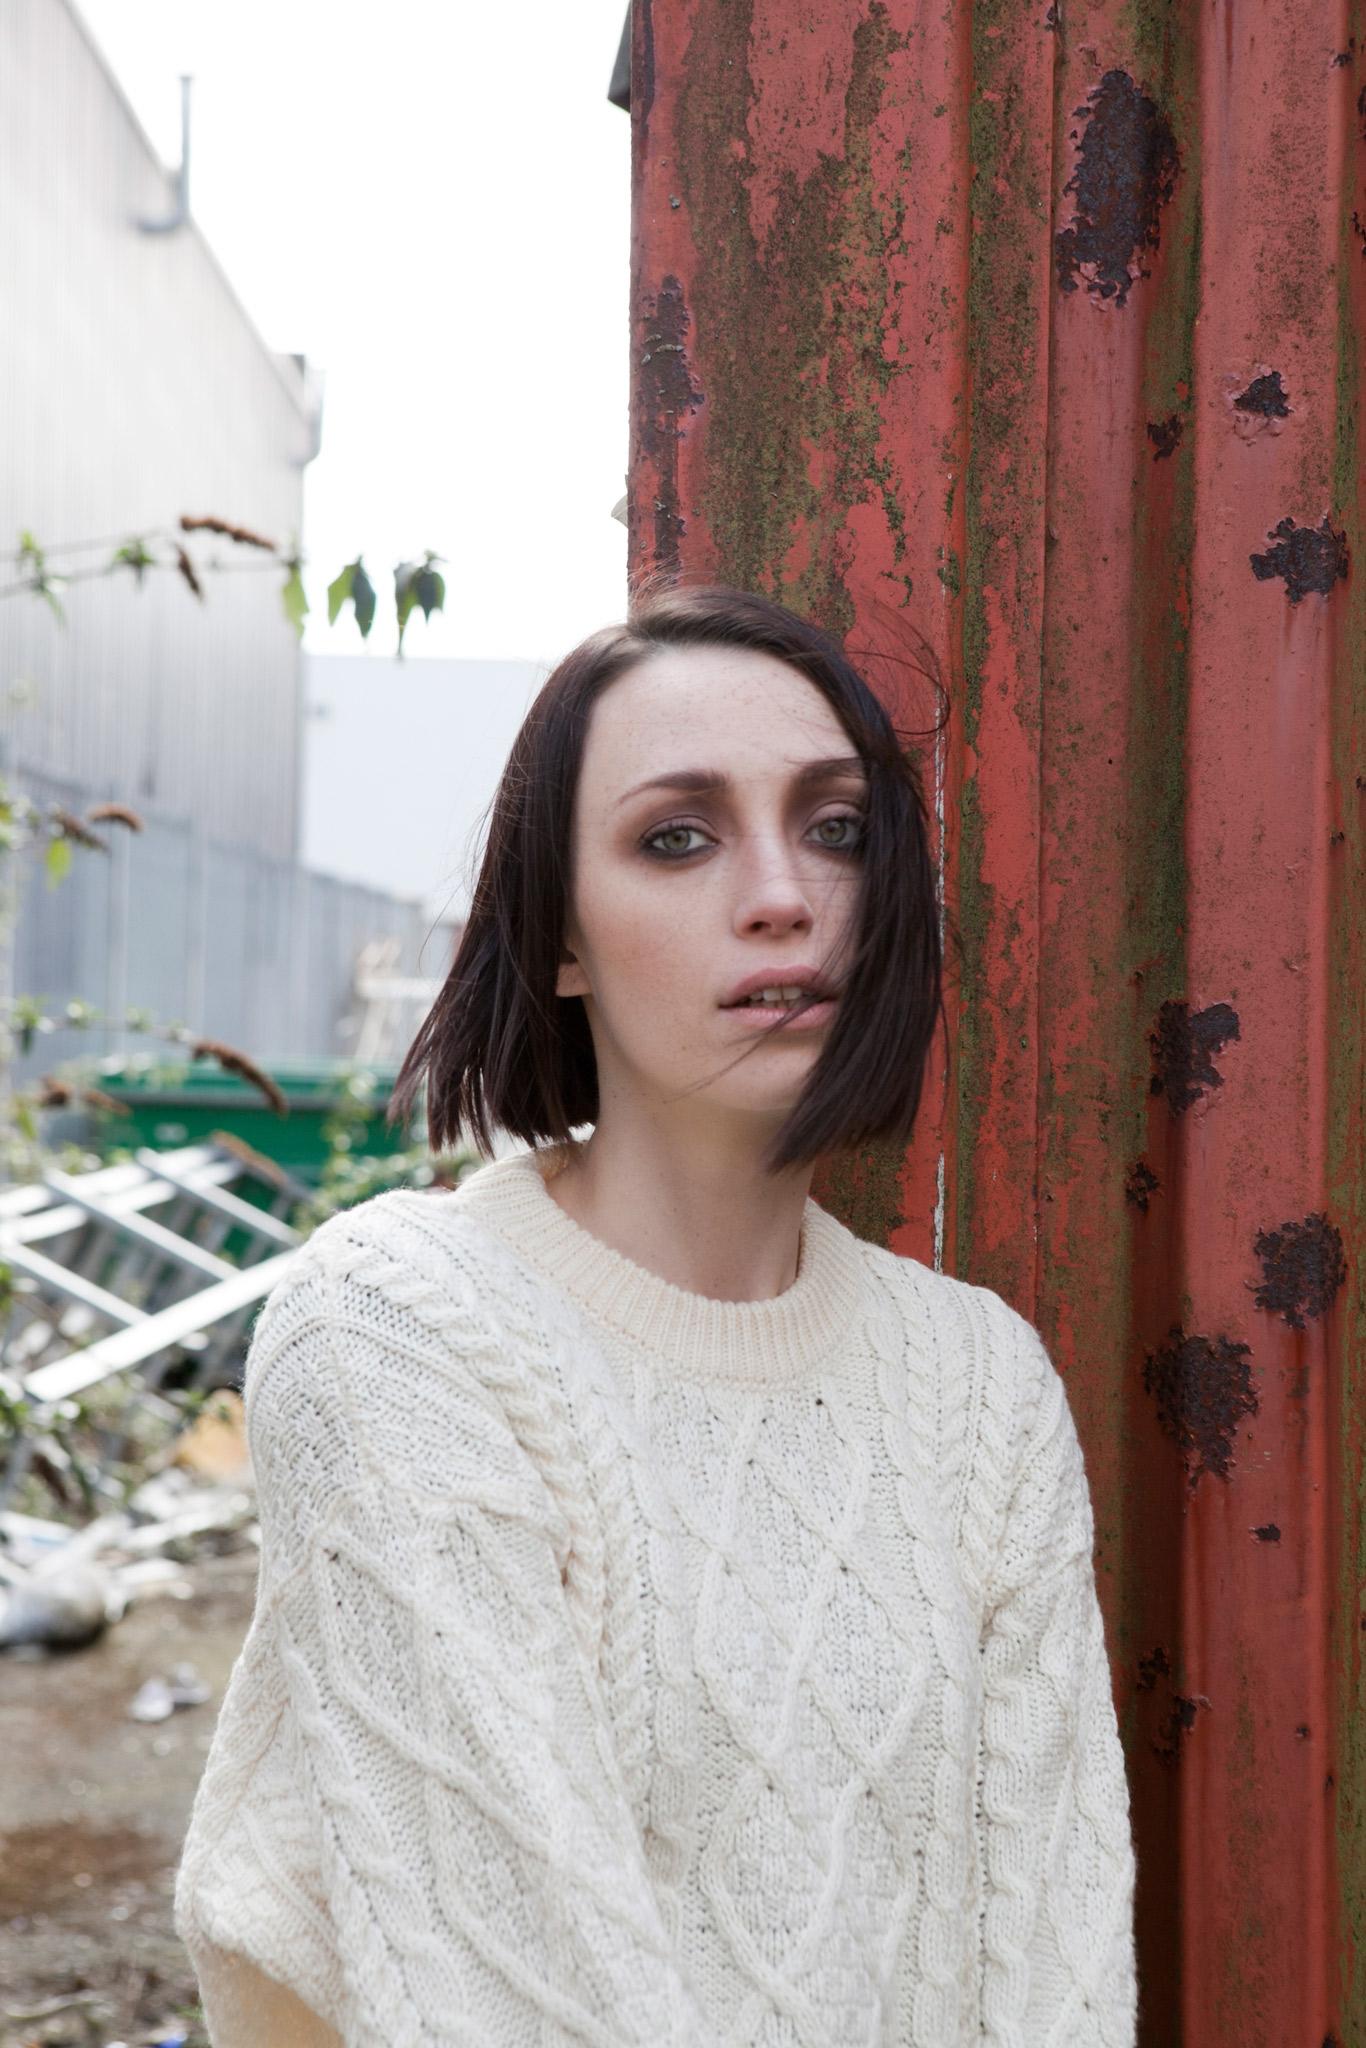 Sarah-McCall-PE-Apr13-(9).jpg